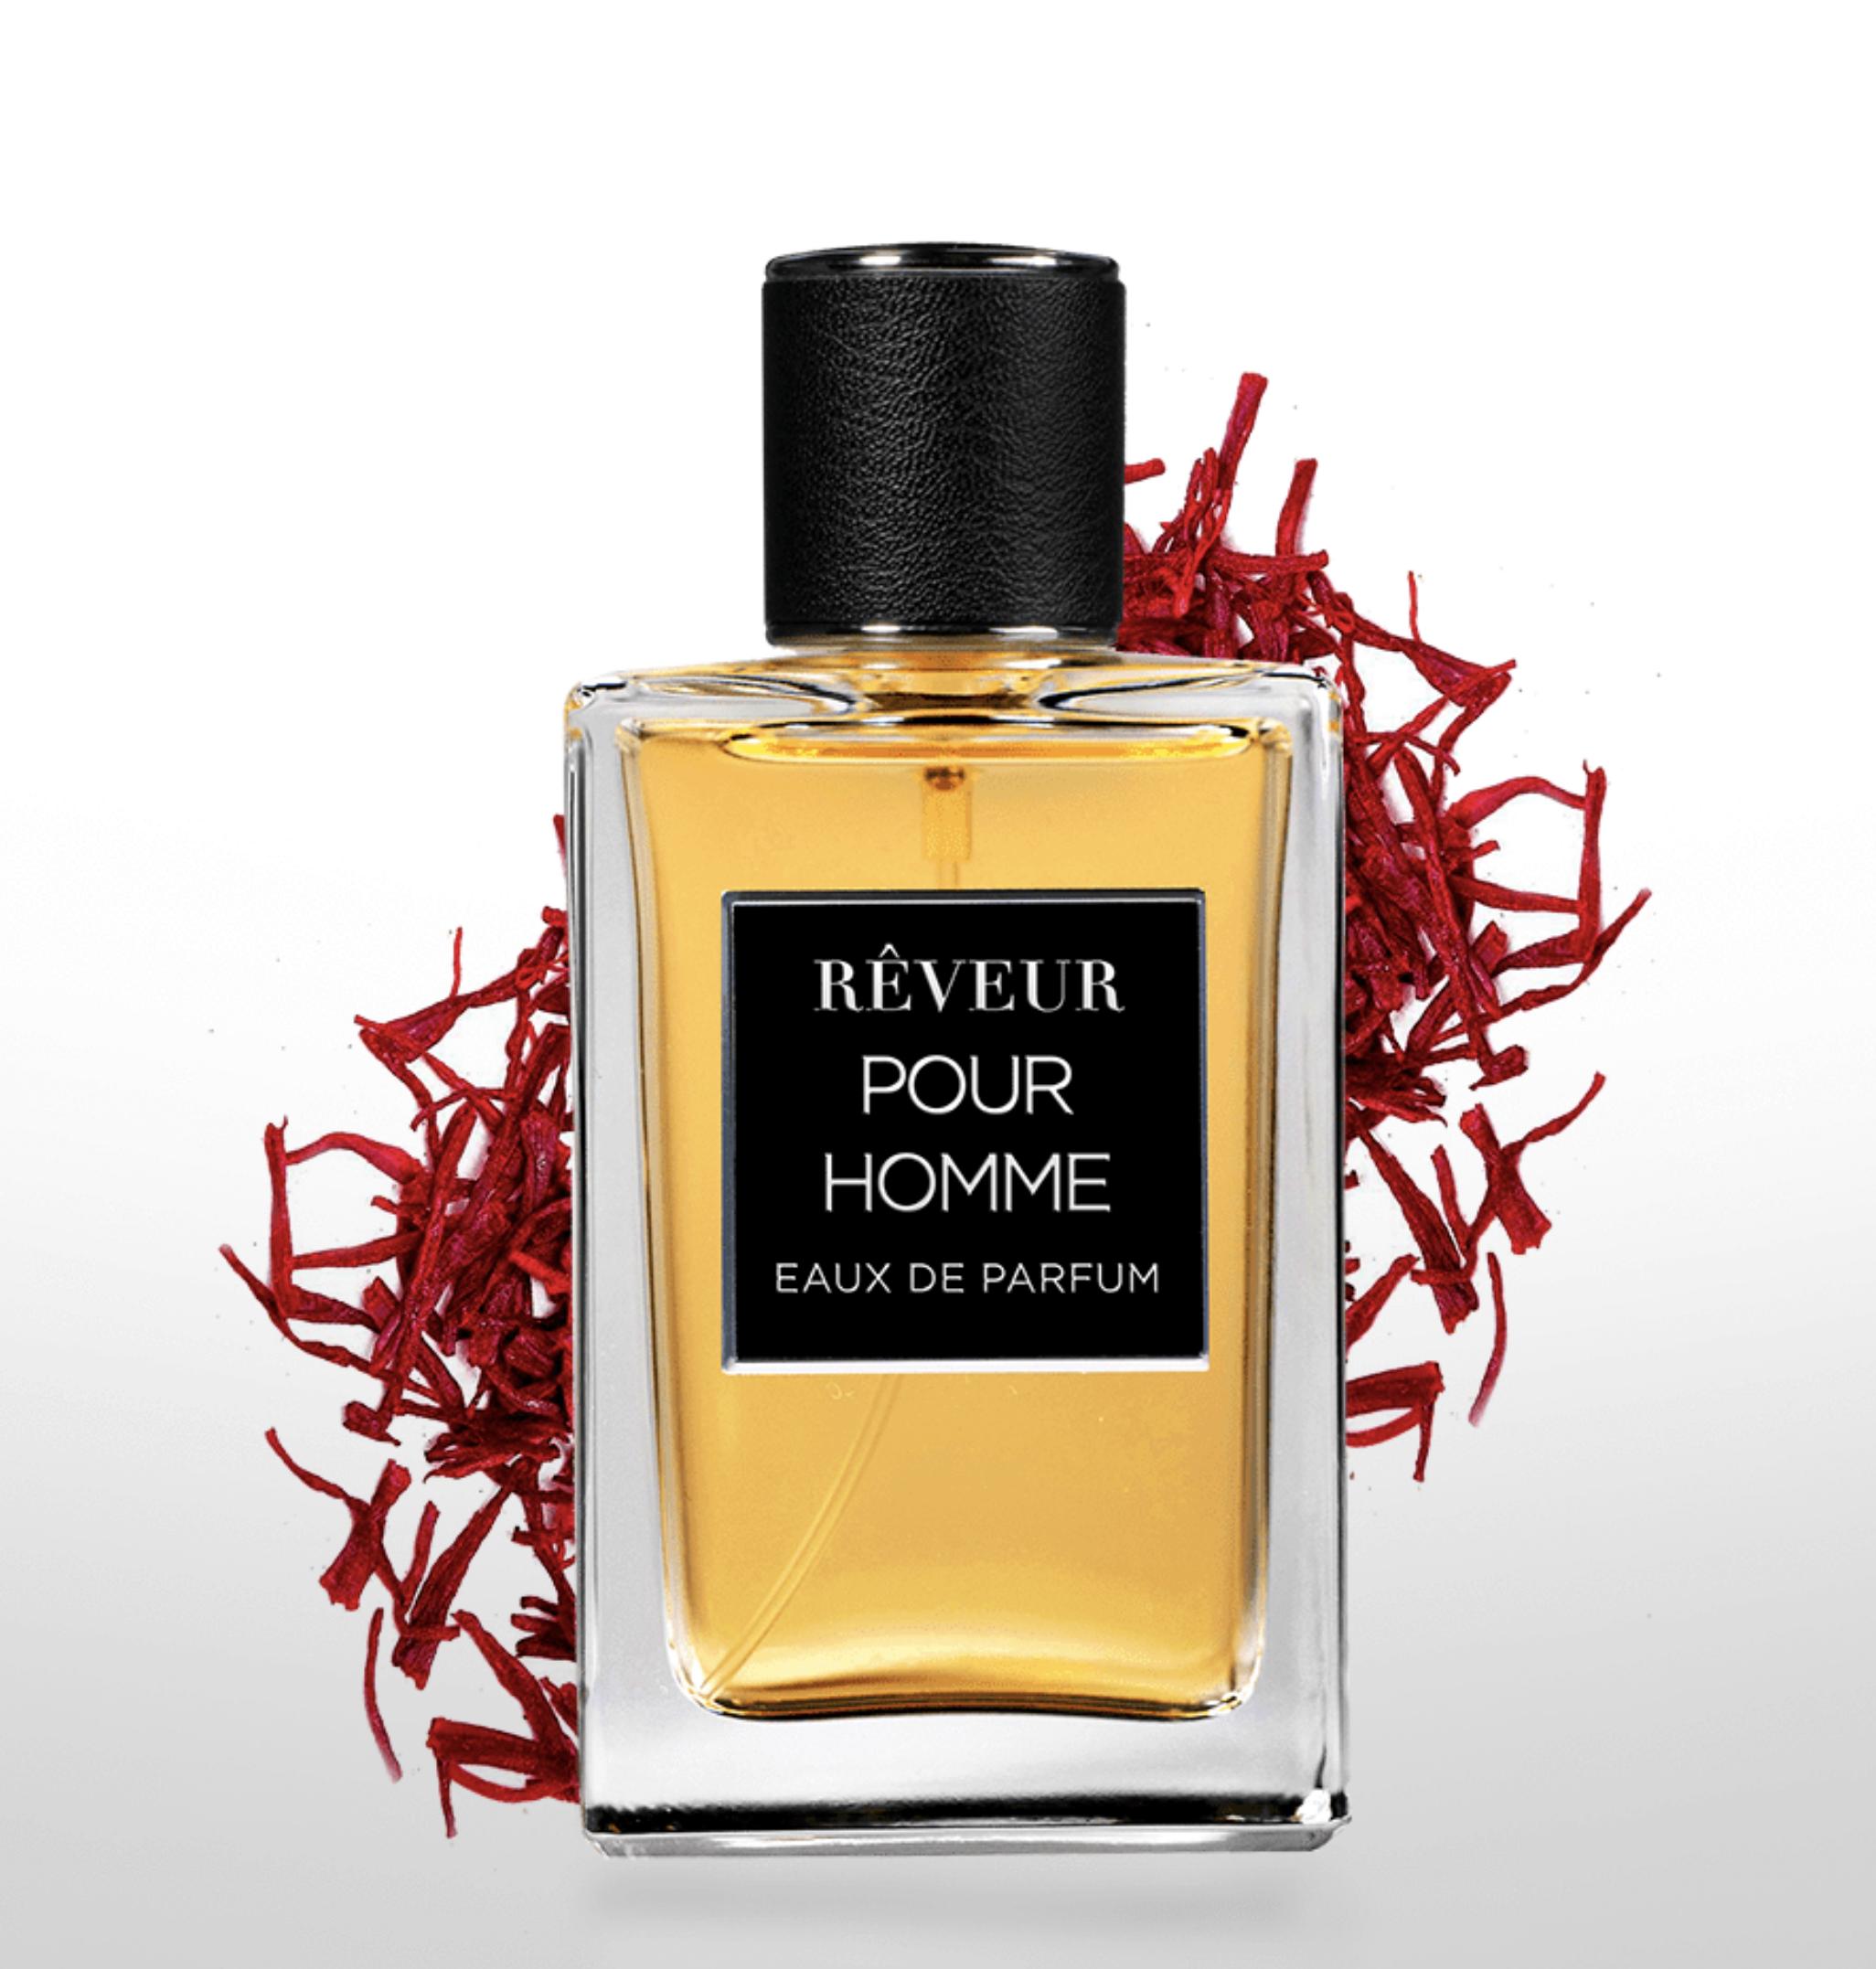 white label perfume